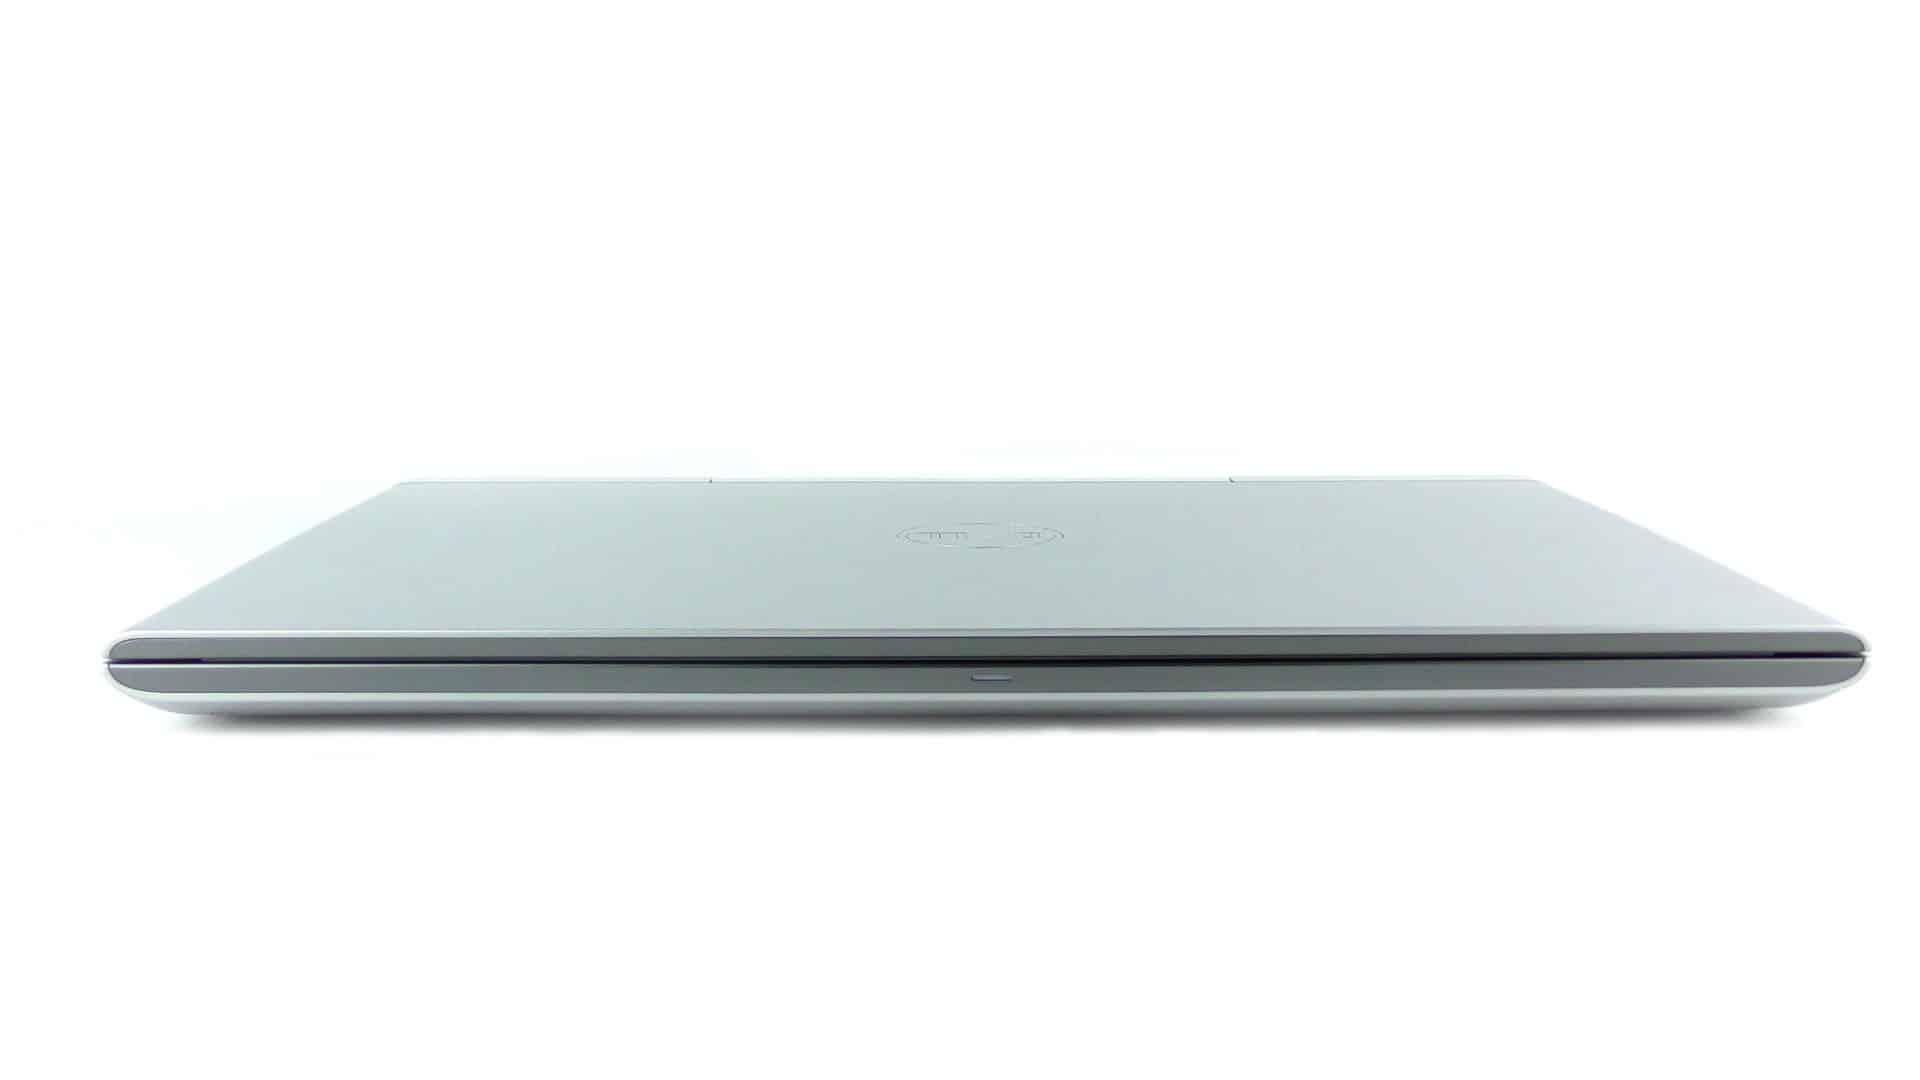 Dell Vostro 7570 - front notebooka